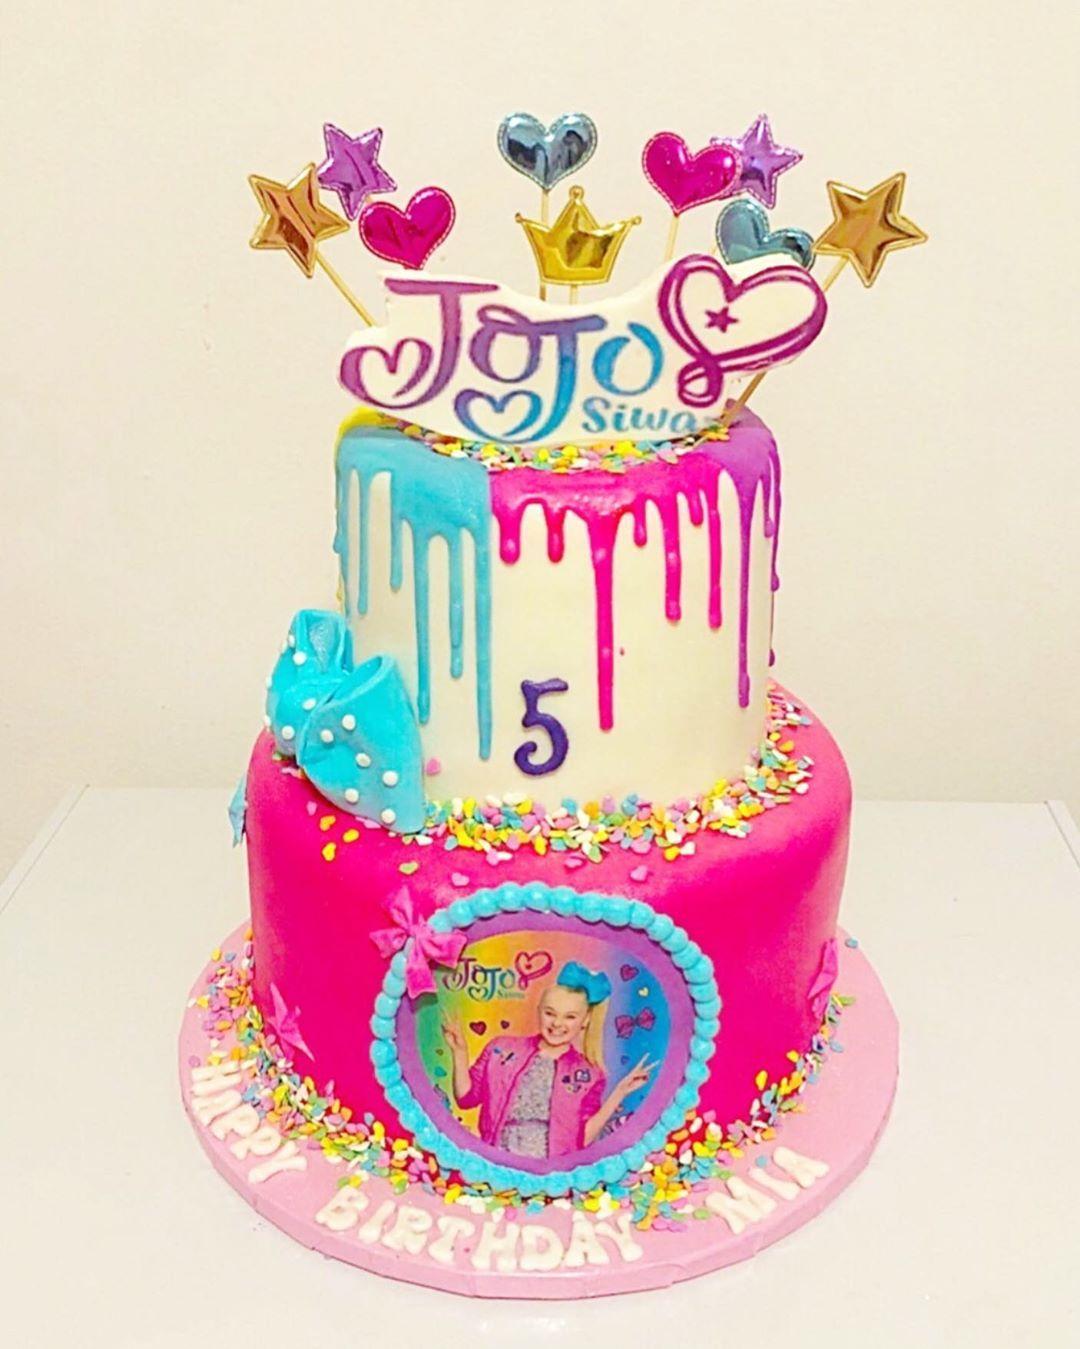 jojosiwa jojosiwacake floralcake cakes food foodie